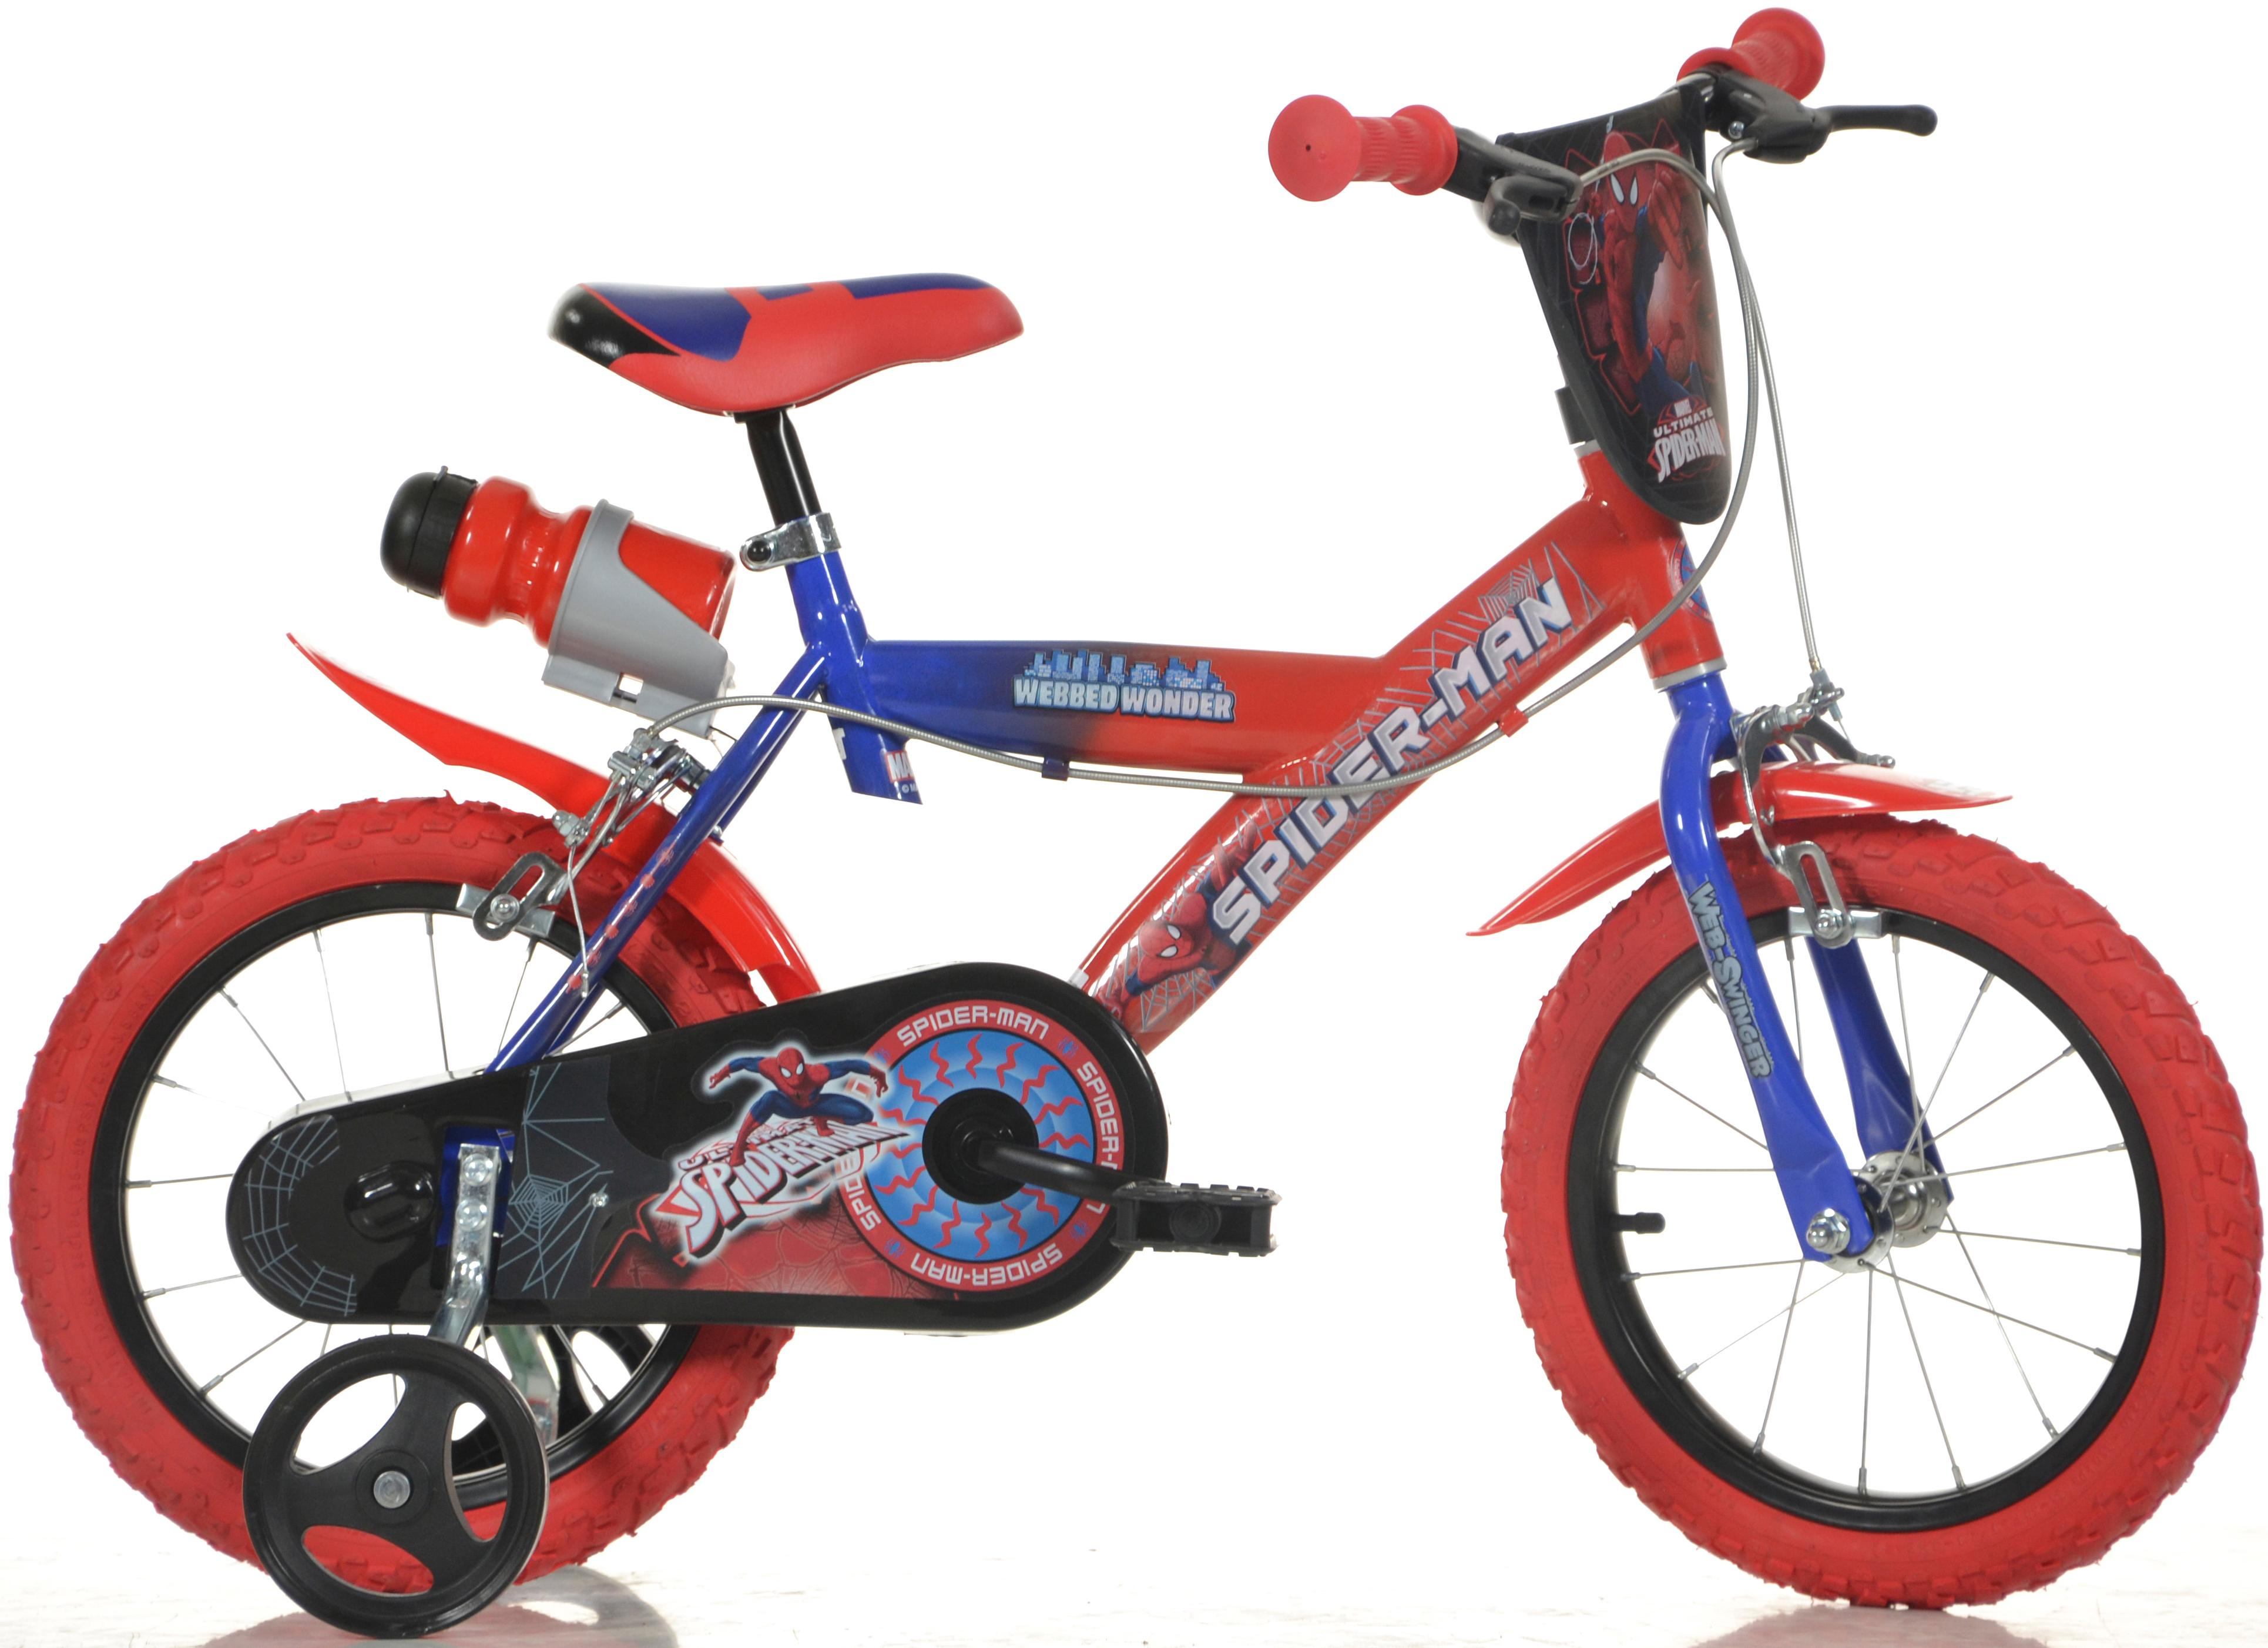 Spiderman Kids Bike - 16 inch Wheel